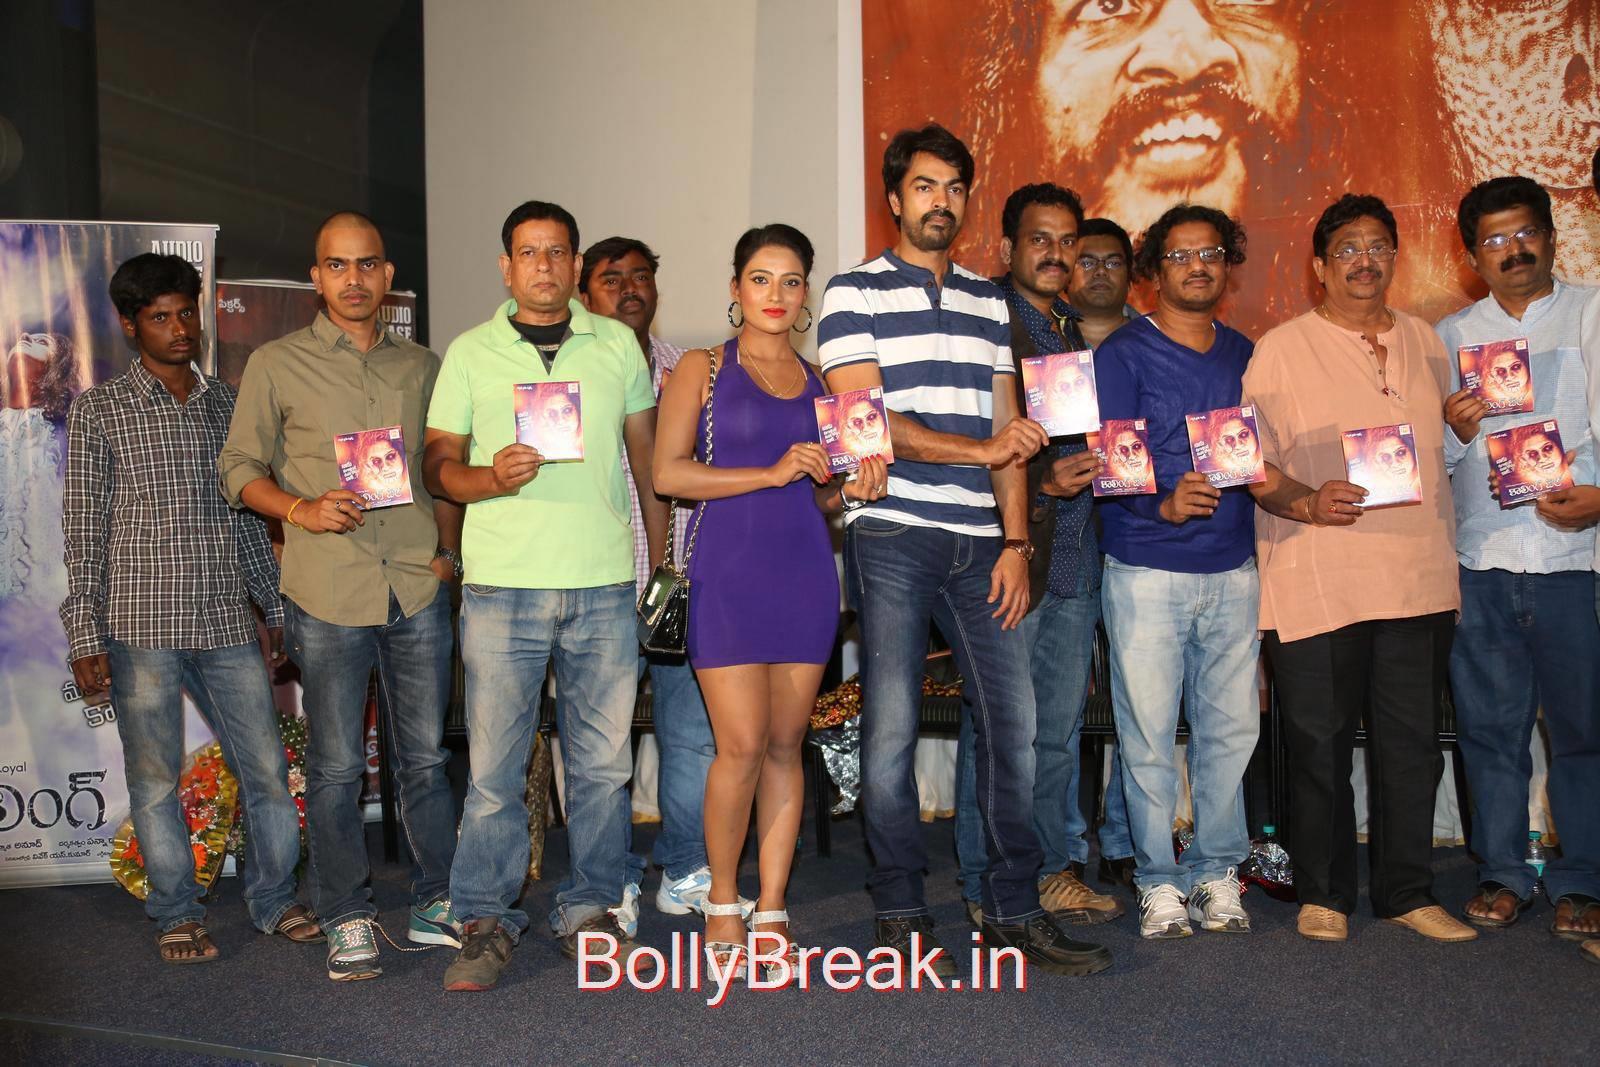 Ravi Varma-Calling Bell Movie Audio Launch Images, Lucky, Vriti Khanna,Mamatha Rahuth Hot Pics From Calling Bell Movie Audio Launch